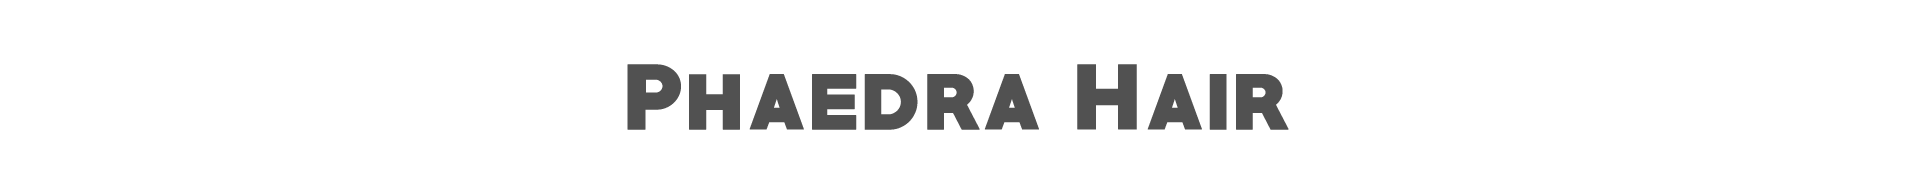 phaedra hair title.png